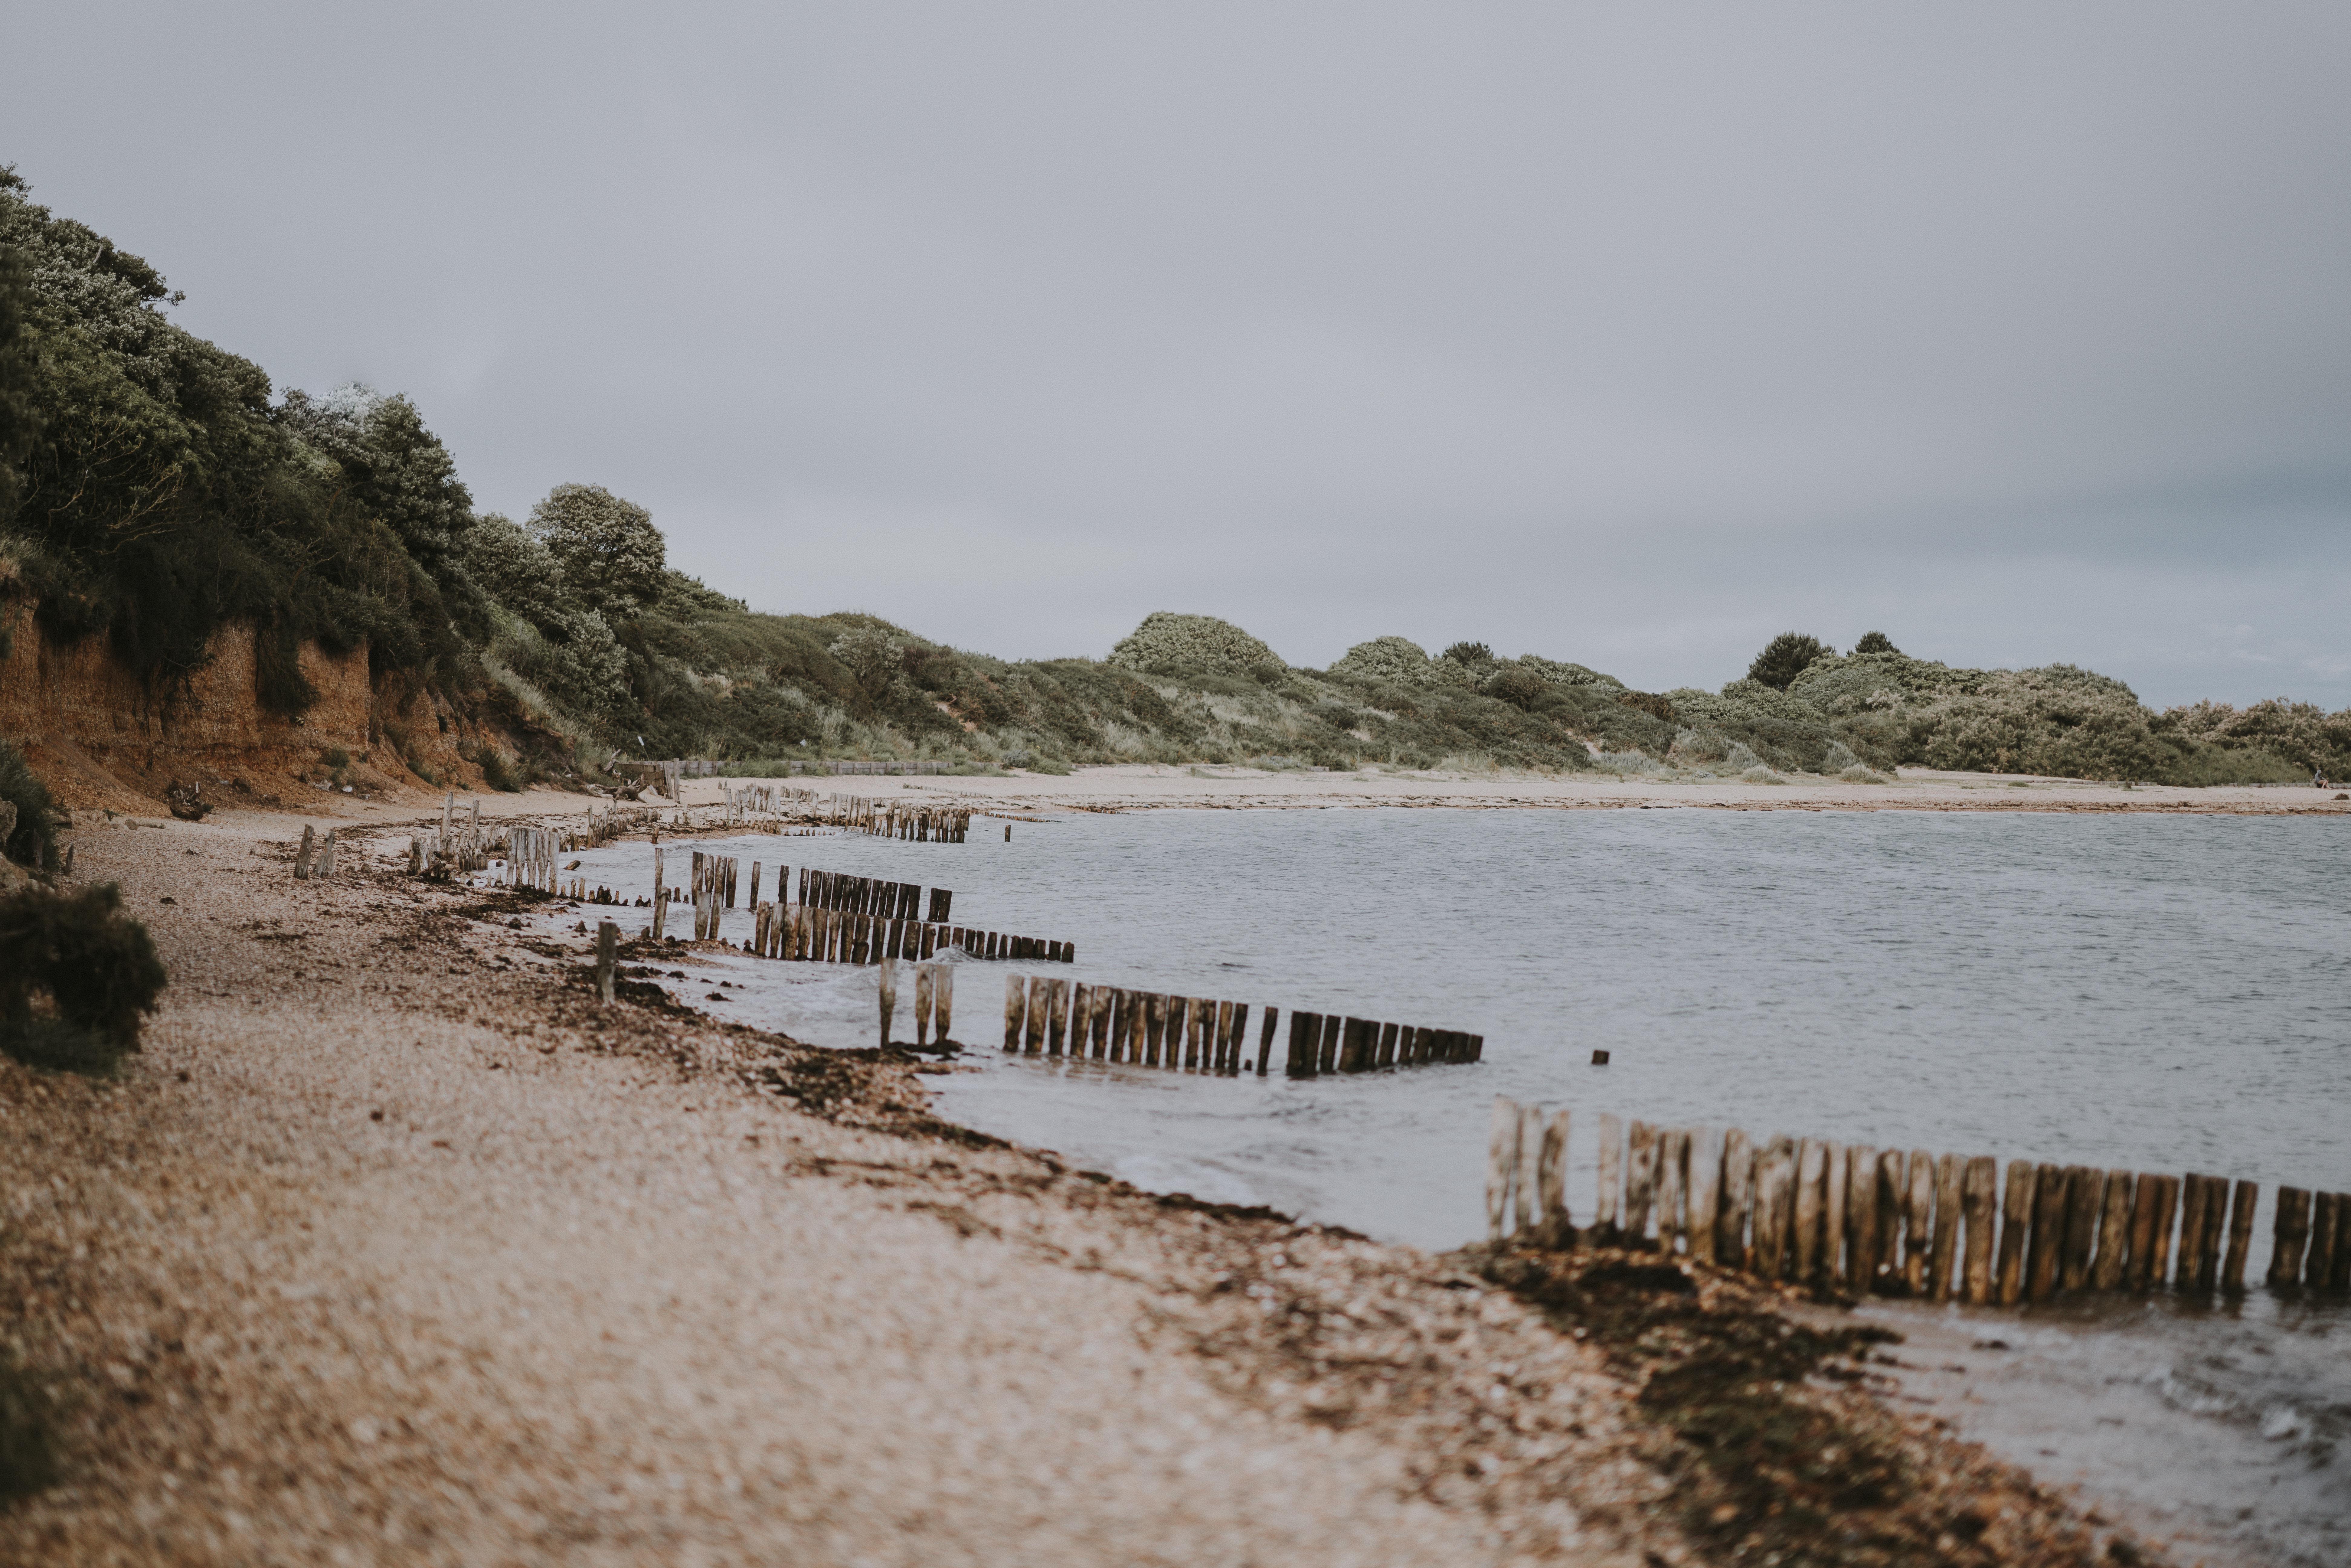 brown fence on seashore near trees